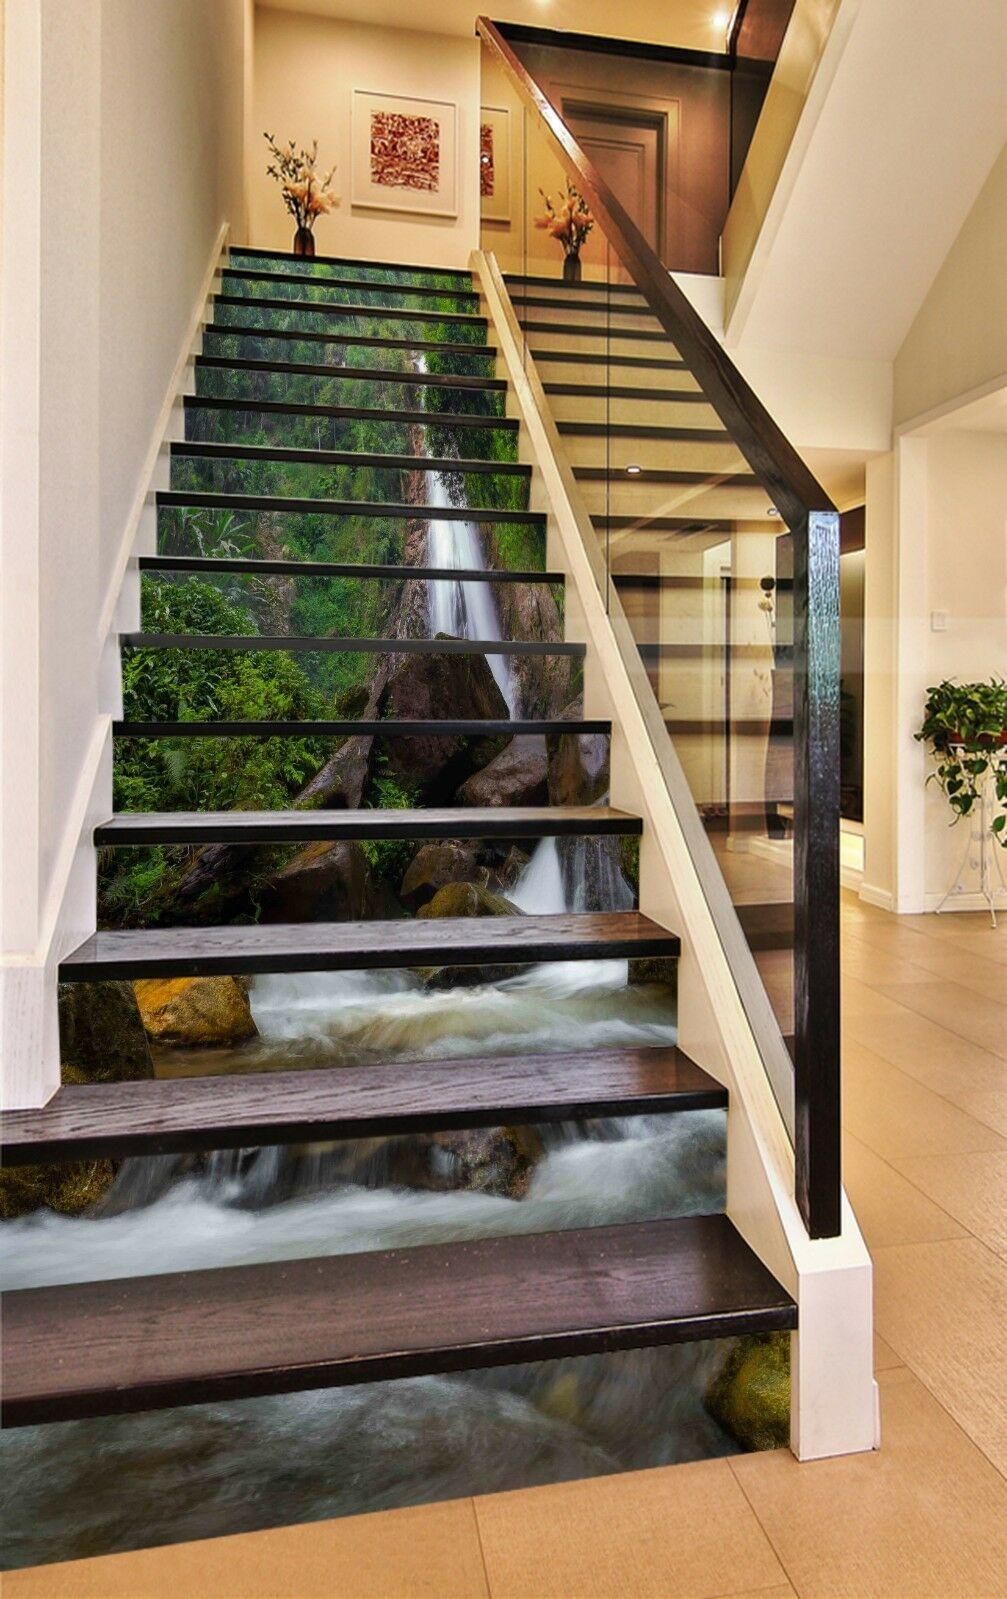 3D Stream Trees 05 Stair Risers Decoration Photo Mural Vinyl Decal Wallpaper CA